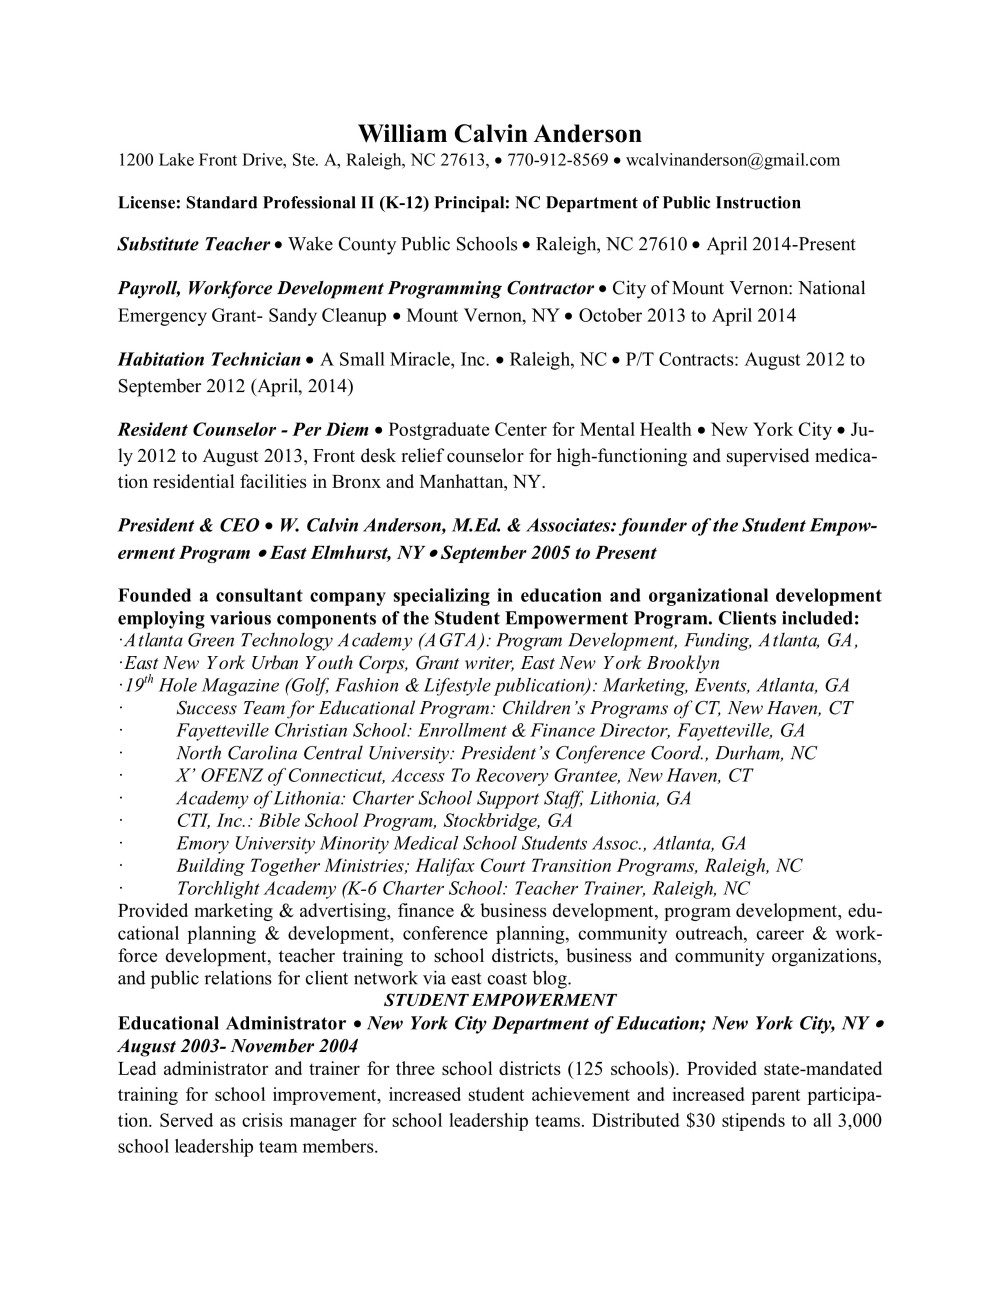 W. Calvin Anderson, M.Ed Resume  page 1